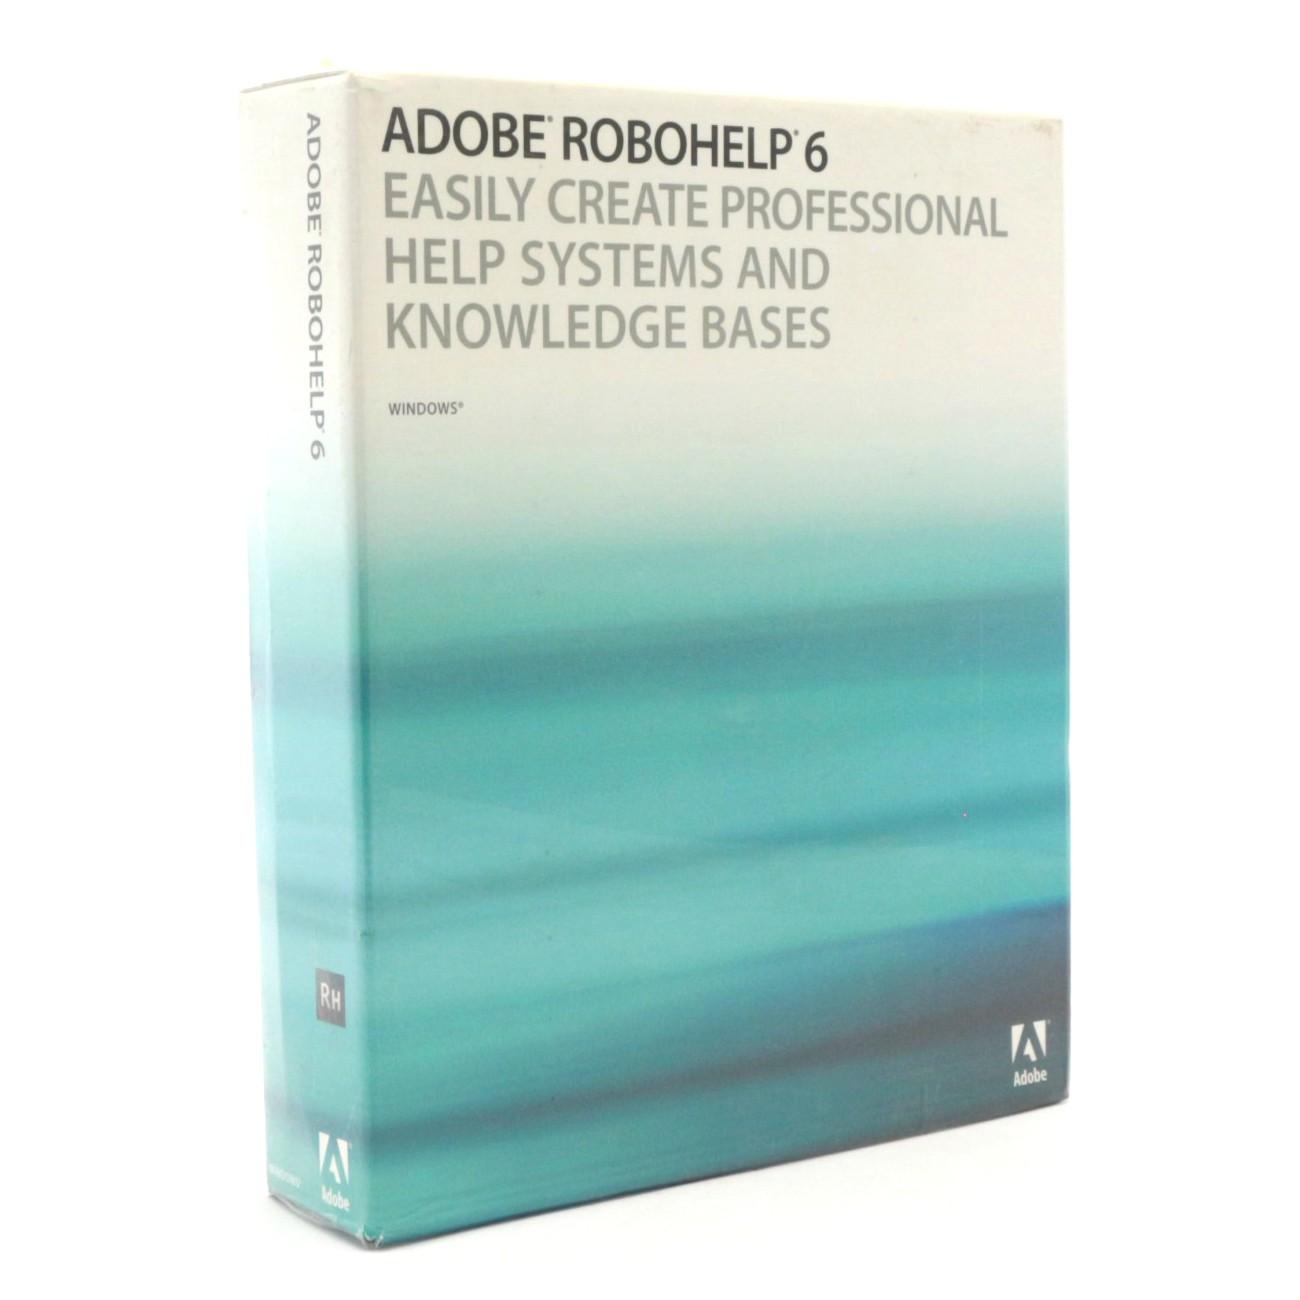 Adobe Robohelp 6